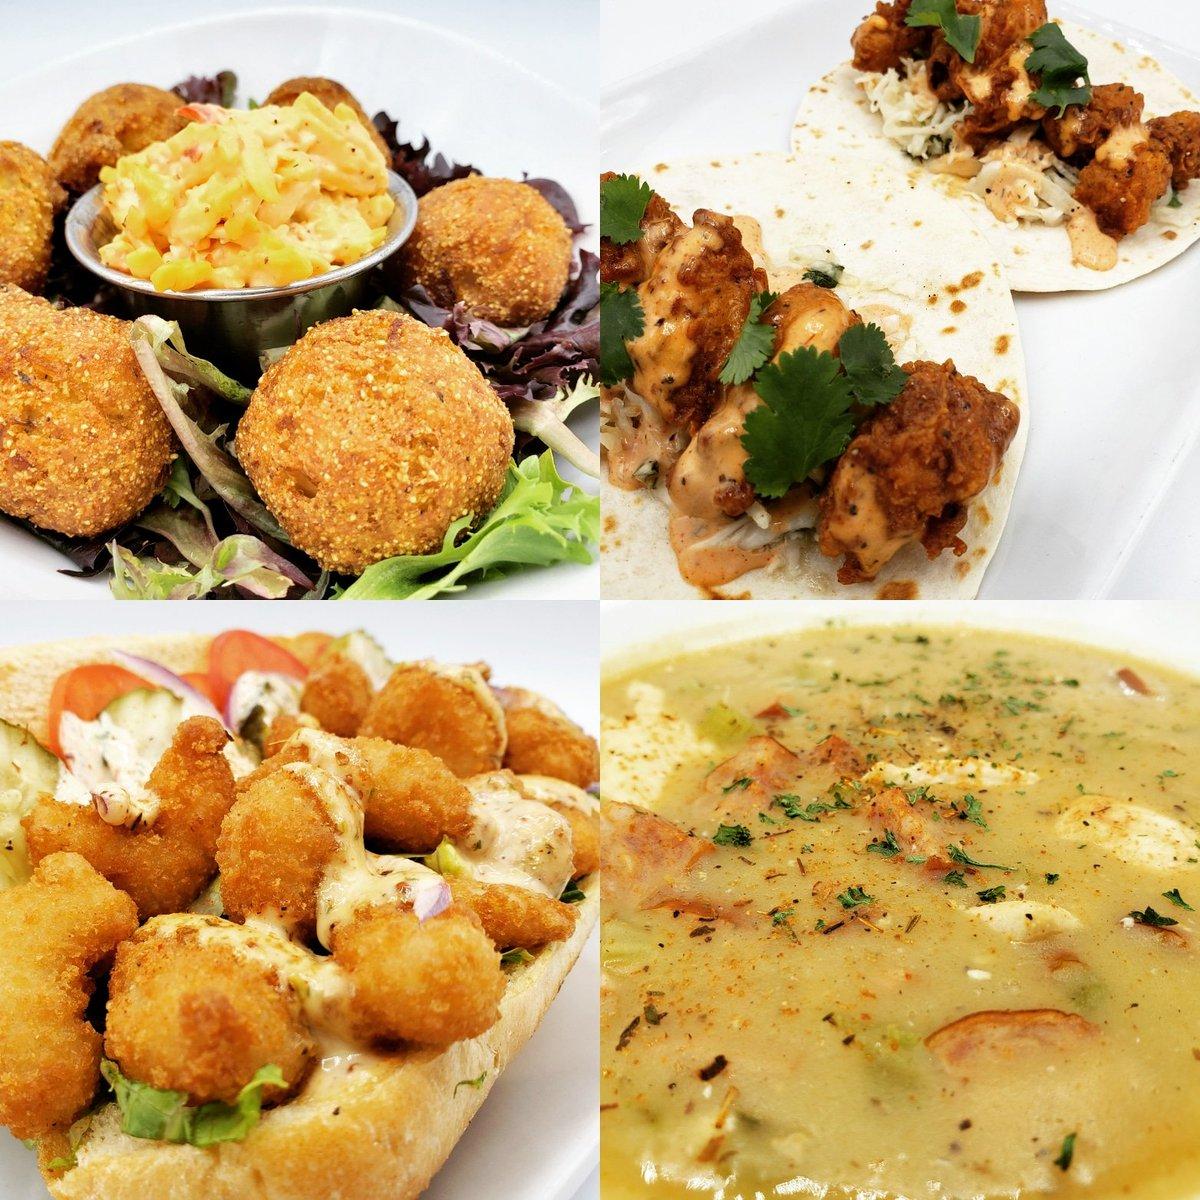 HUSH PUPPIES,  PIMENTO CHEESE, SHRIMP POBOYS, SAUSAGE AND CHICKEN GUMBO! It's #MARDIGRAS and #battleandbrew has all the favorites for you here! I DO DECLARE! #foodporn #food #geekbar #atlanta #atl #noms #cajun #cajunfood #shrimp #gumbo #hushpuppies